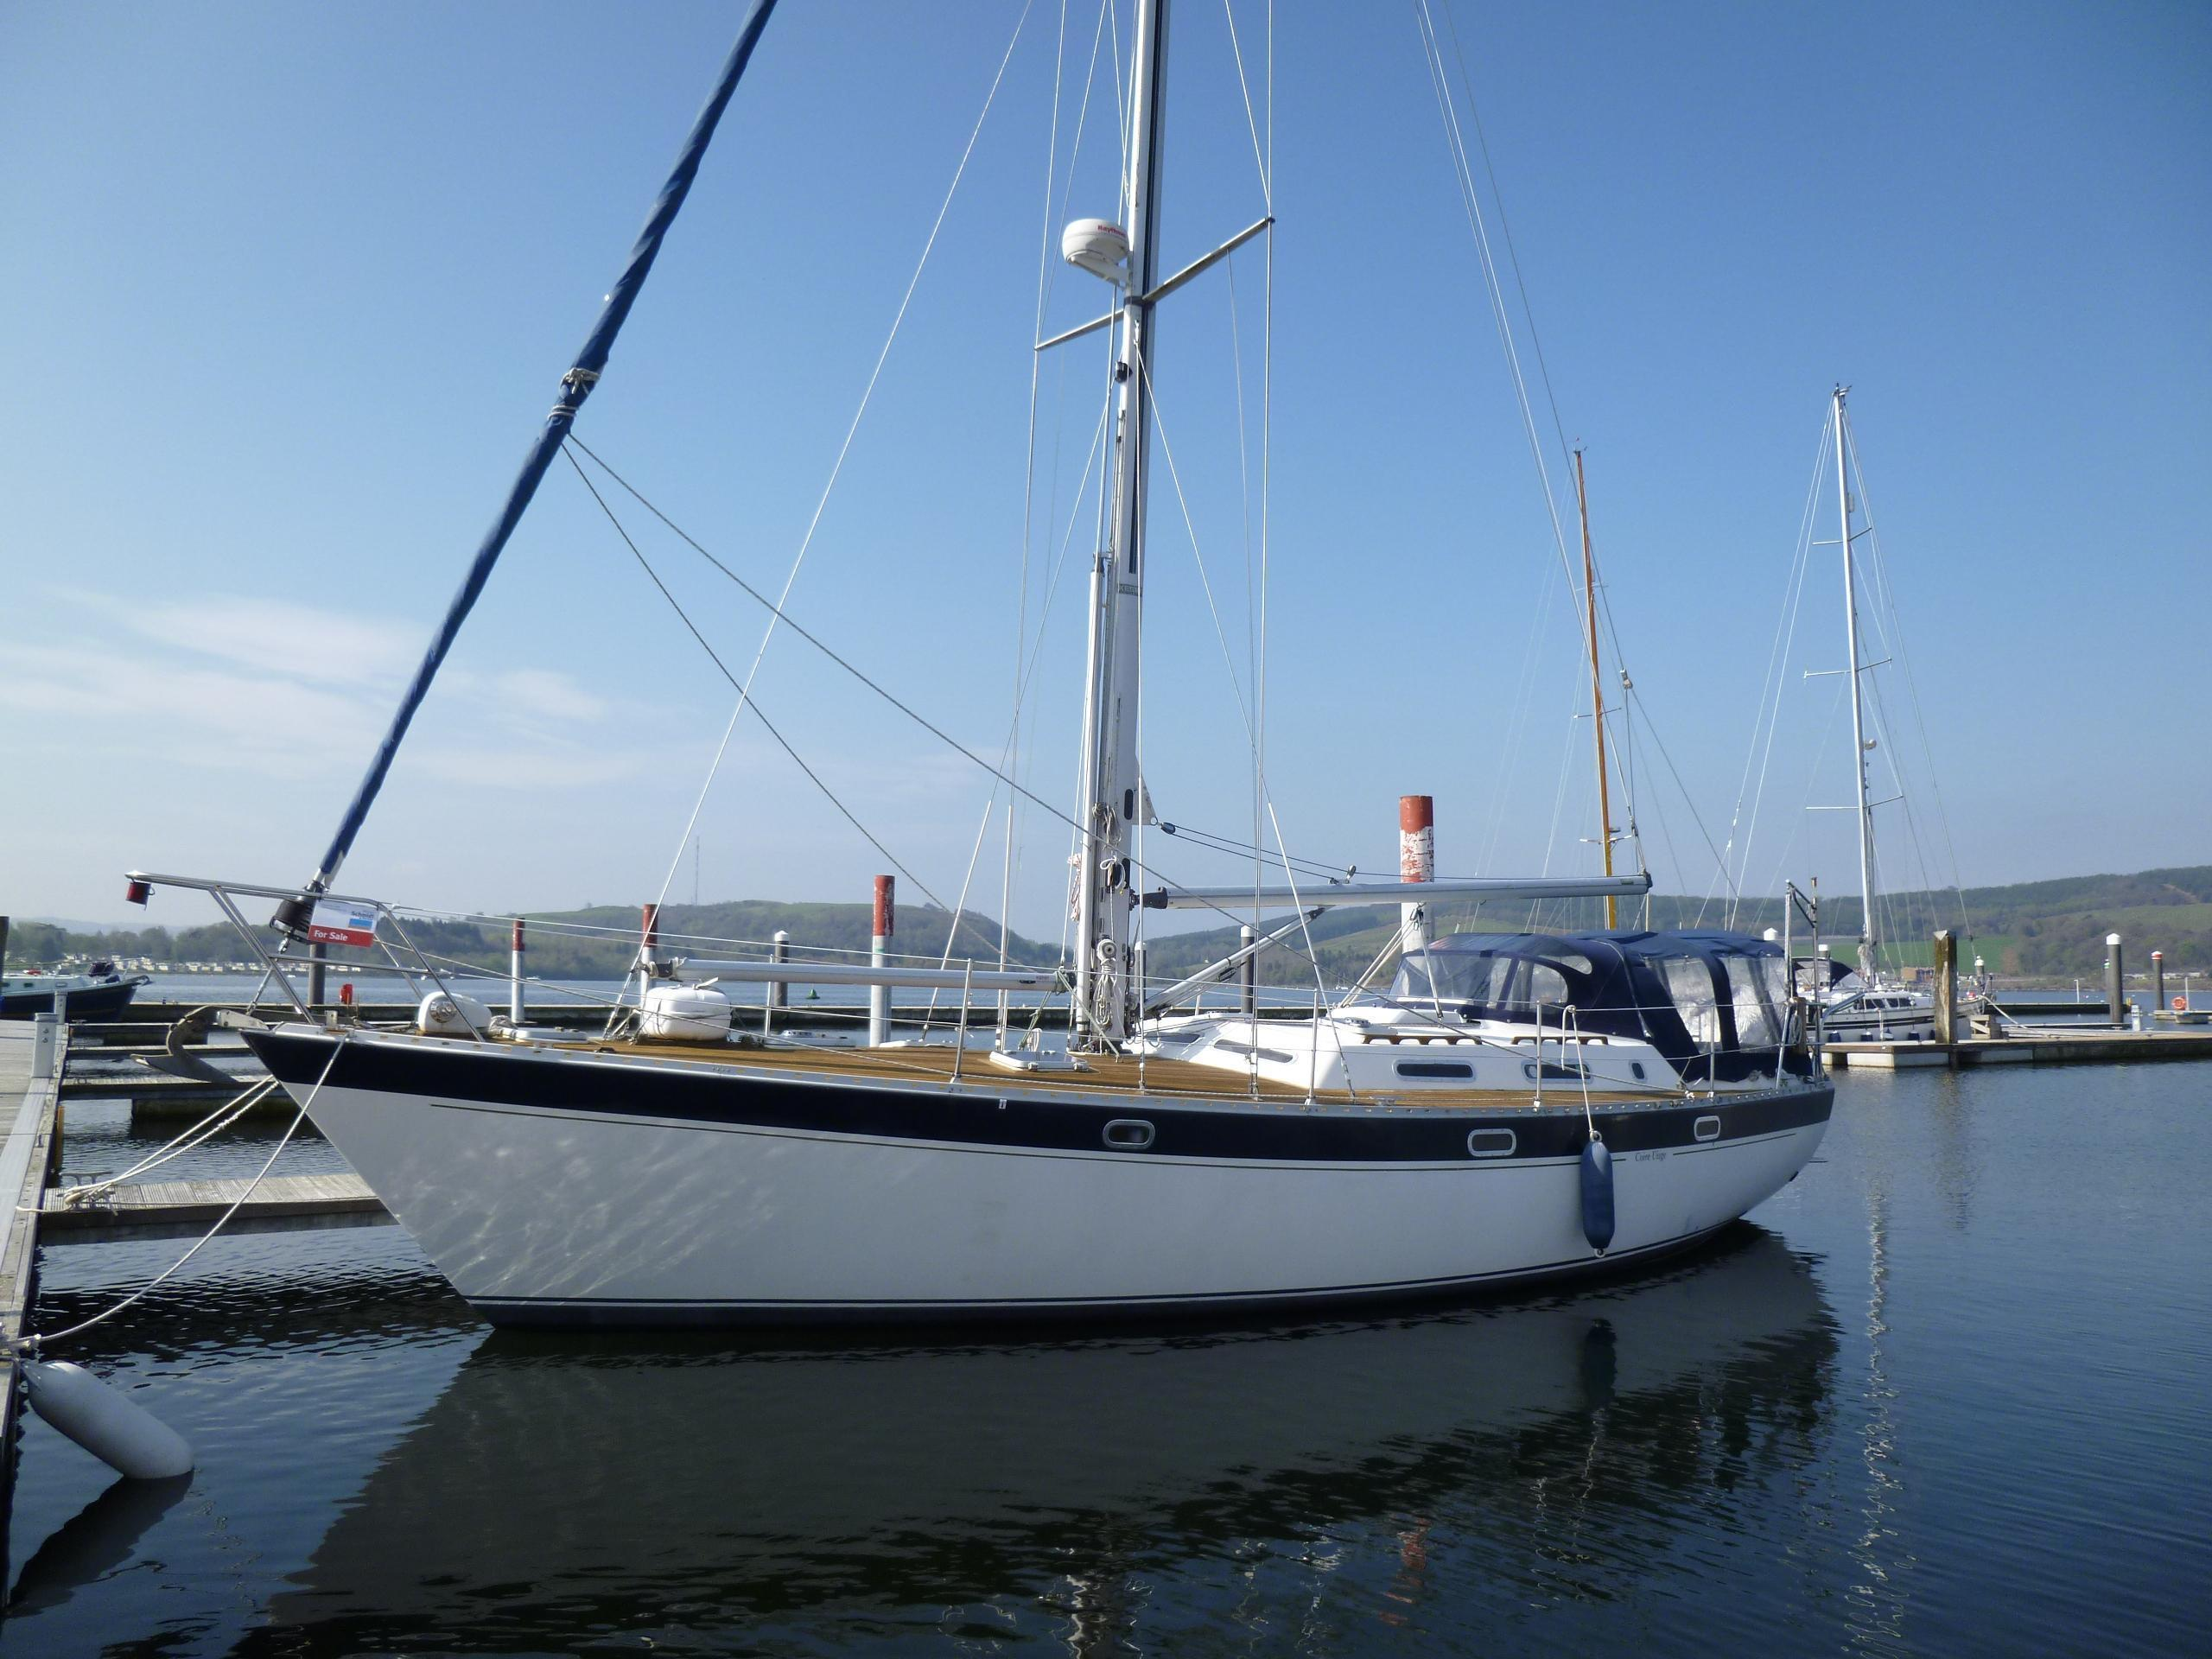 Trident WARRIOR 40, Rhu Marina, Argyll & Bute